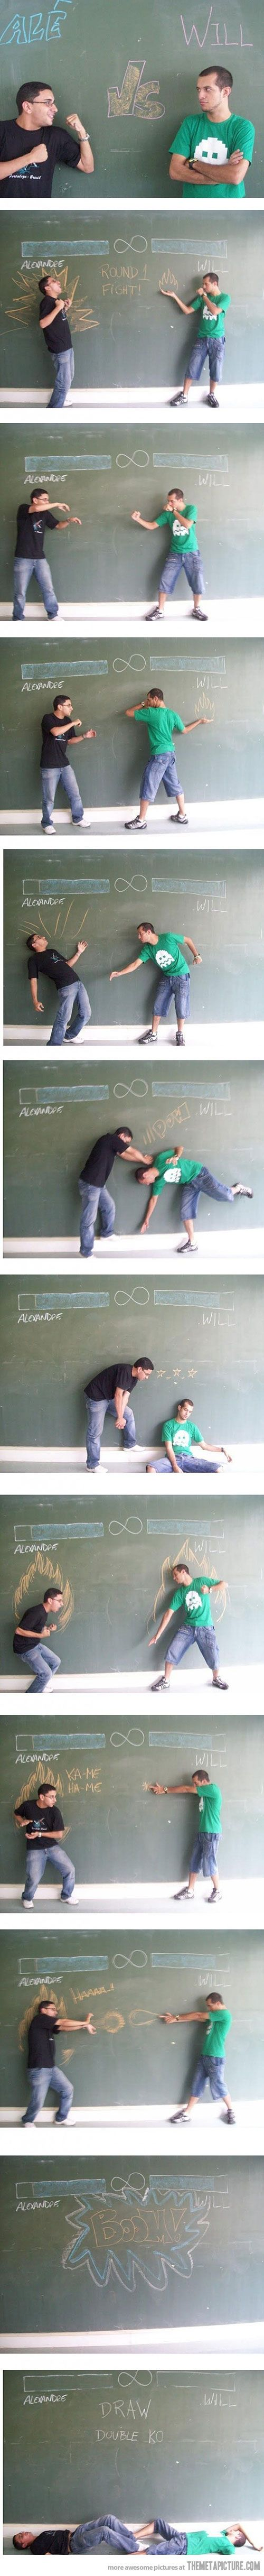 Classroom fight